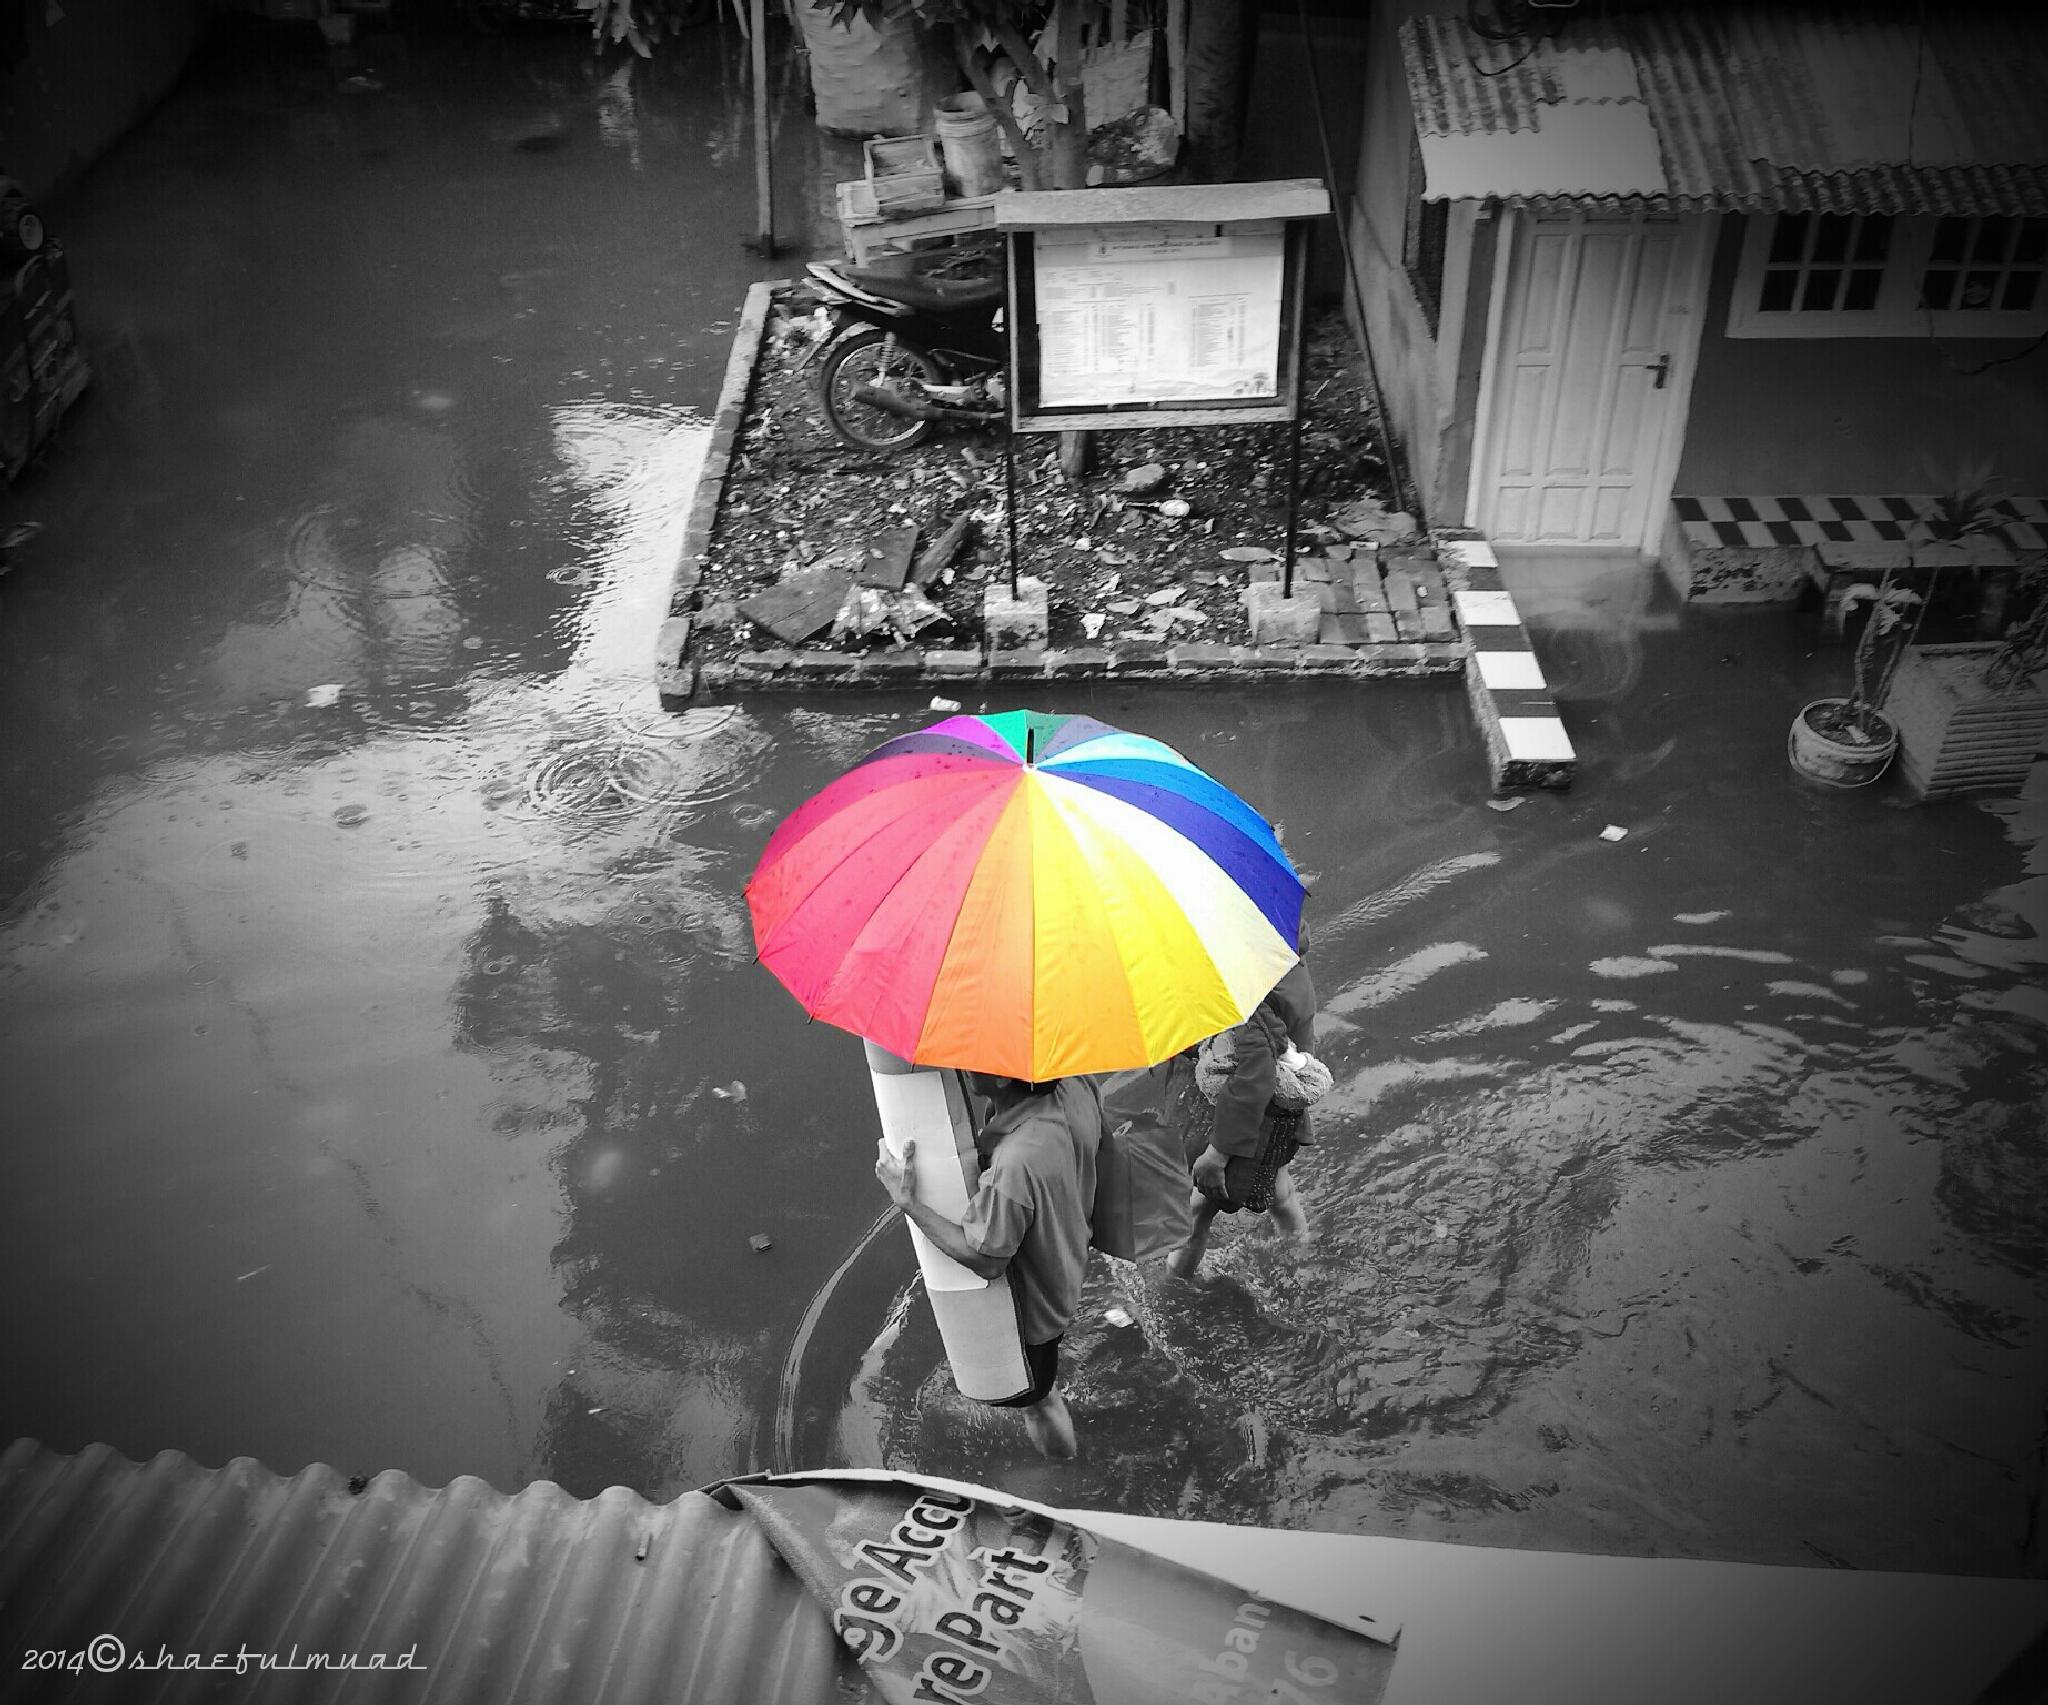 reversed flood jakarta by Shaeful Muad